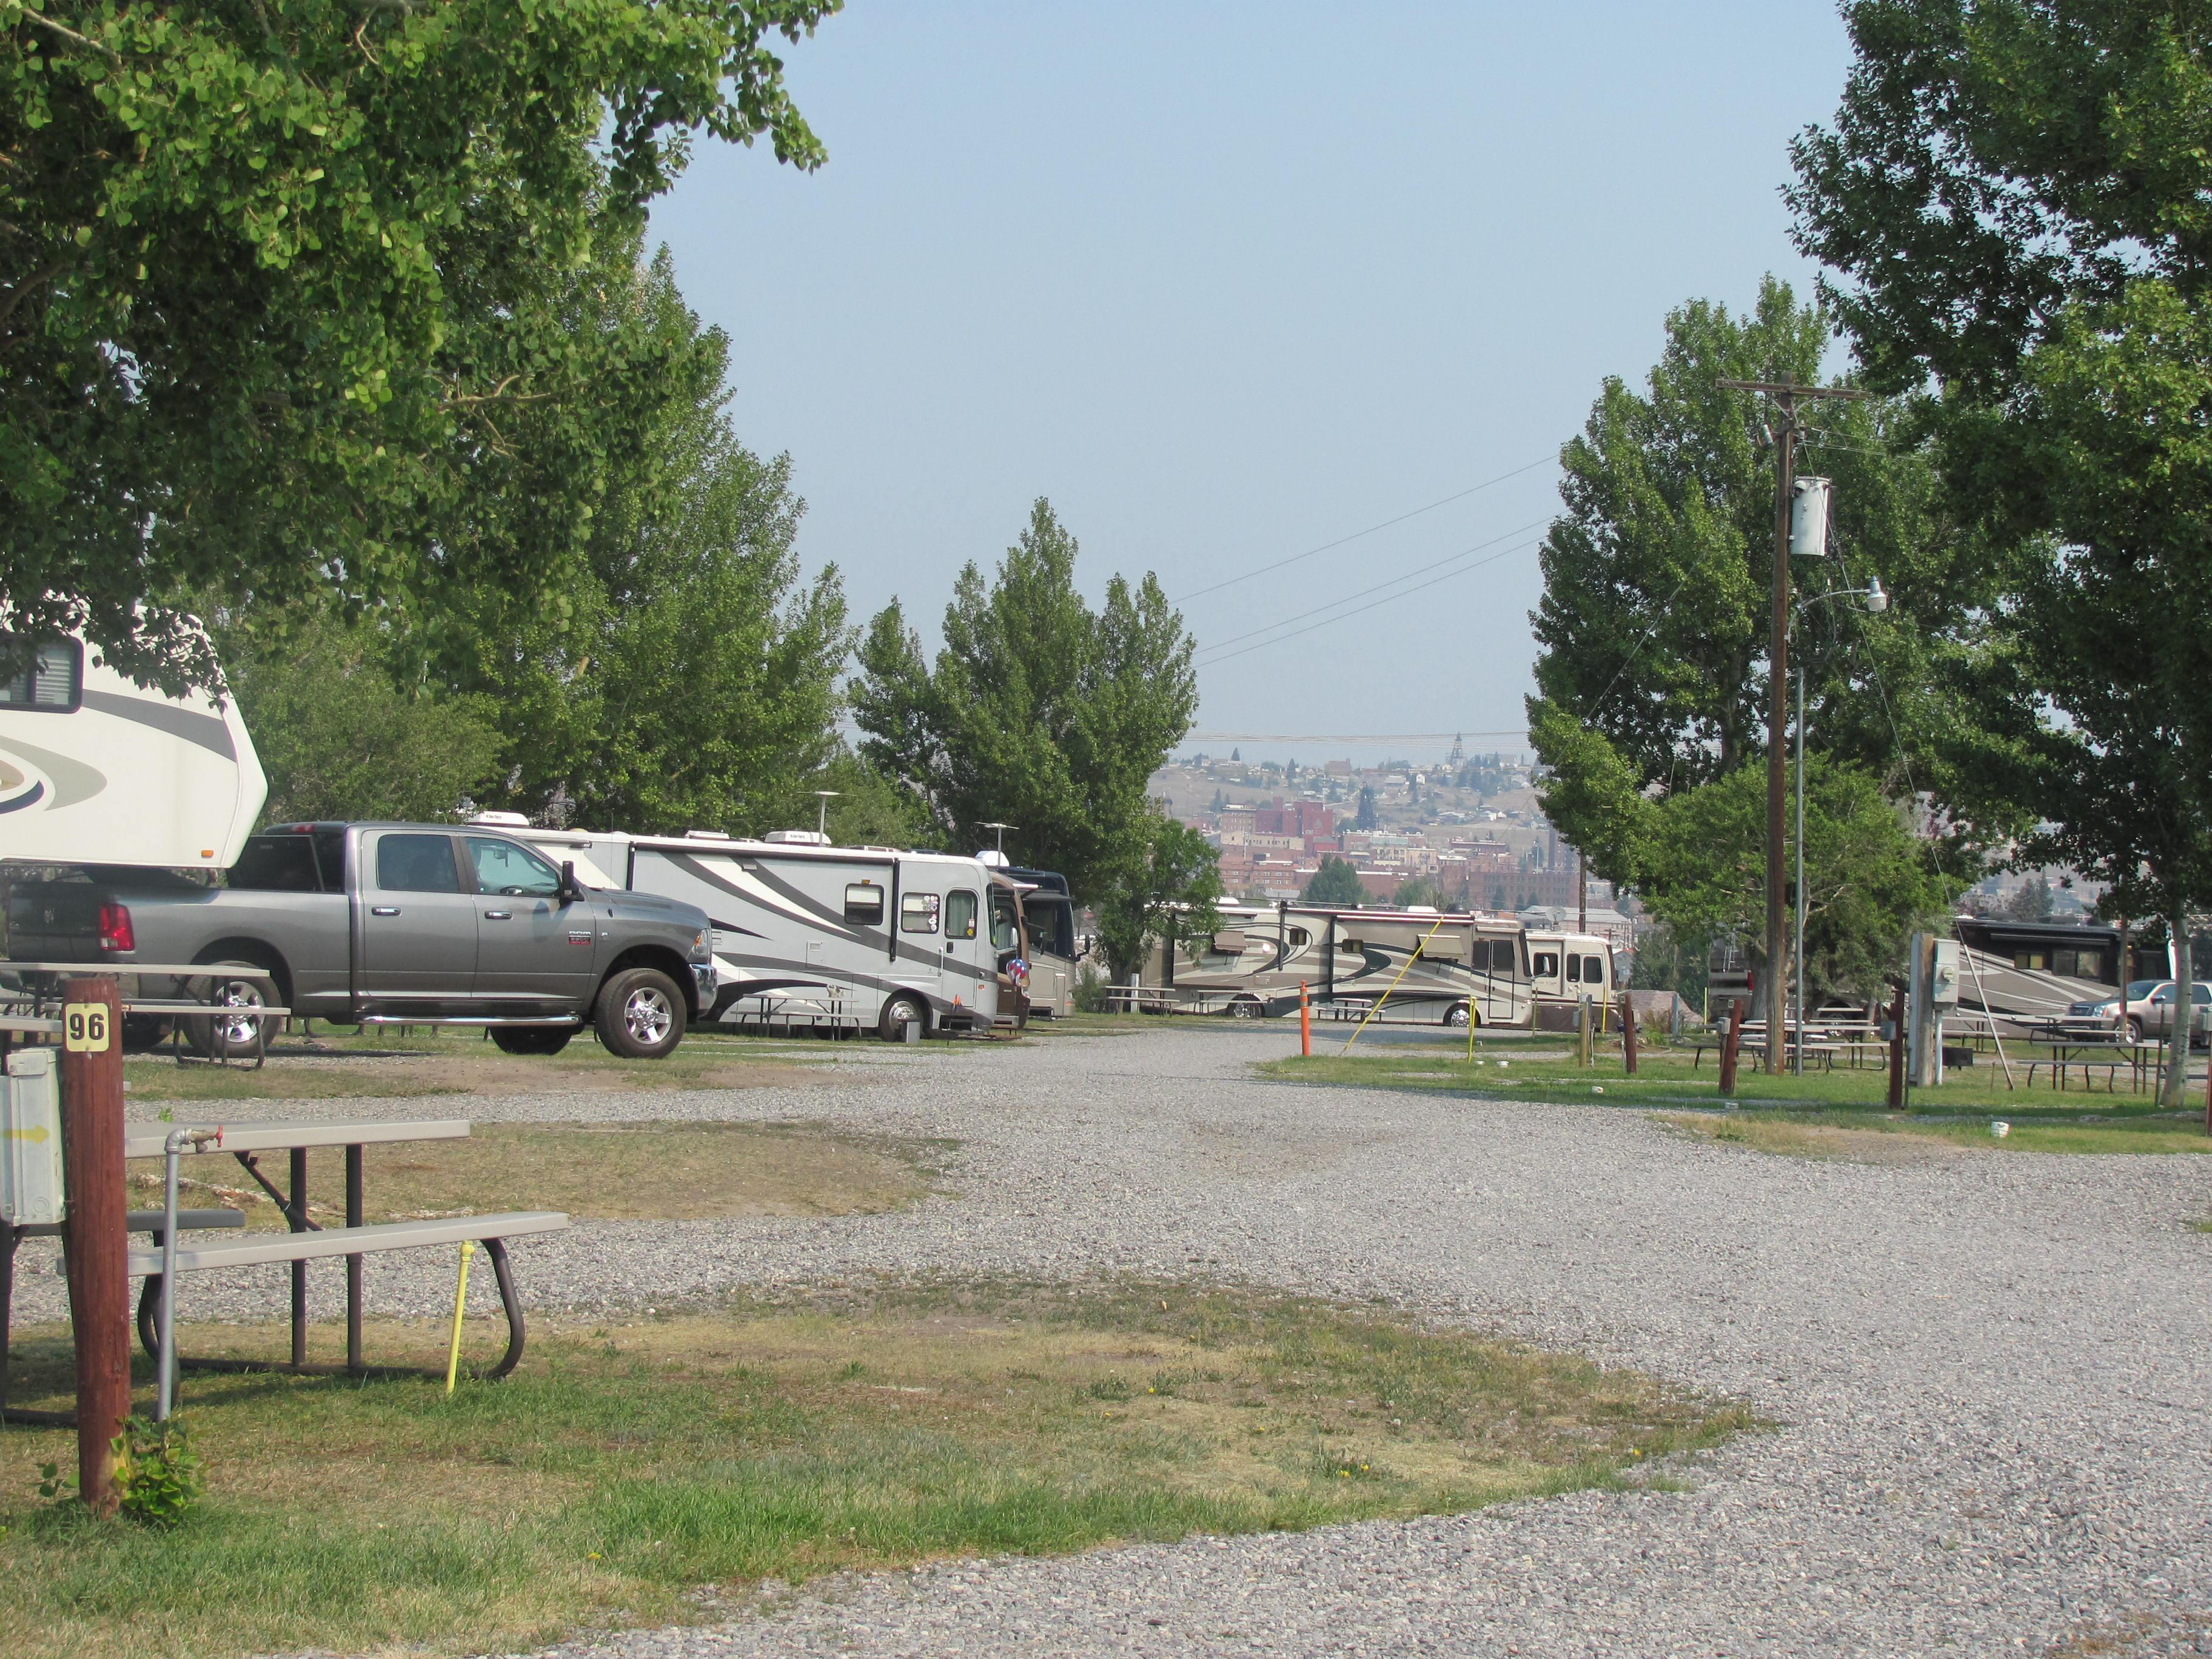 Butte KOA Journey image 3